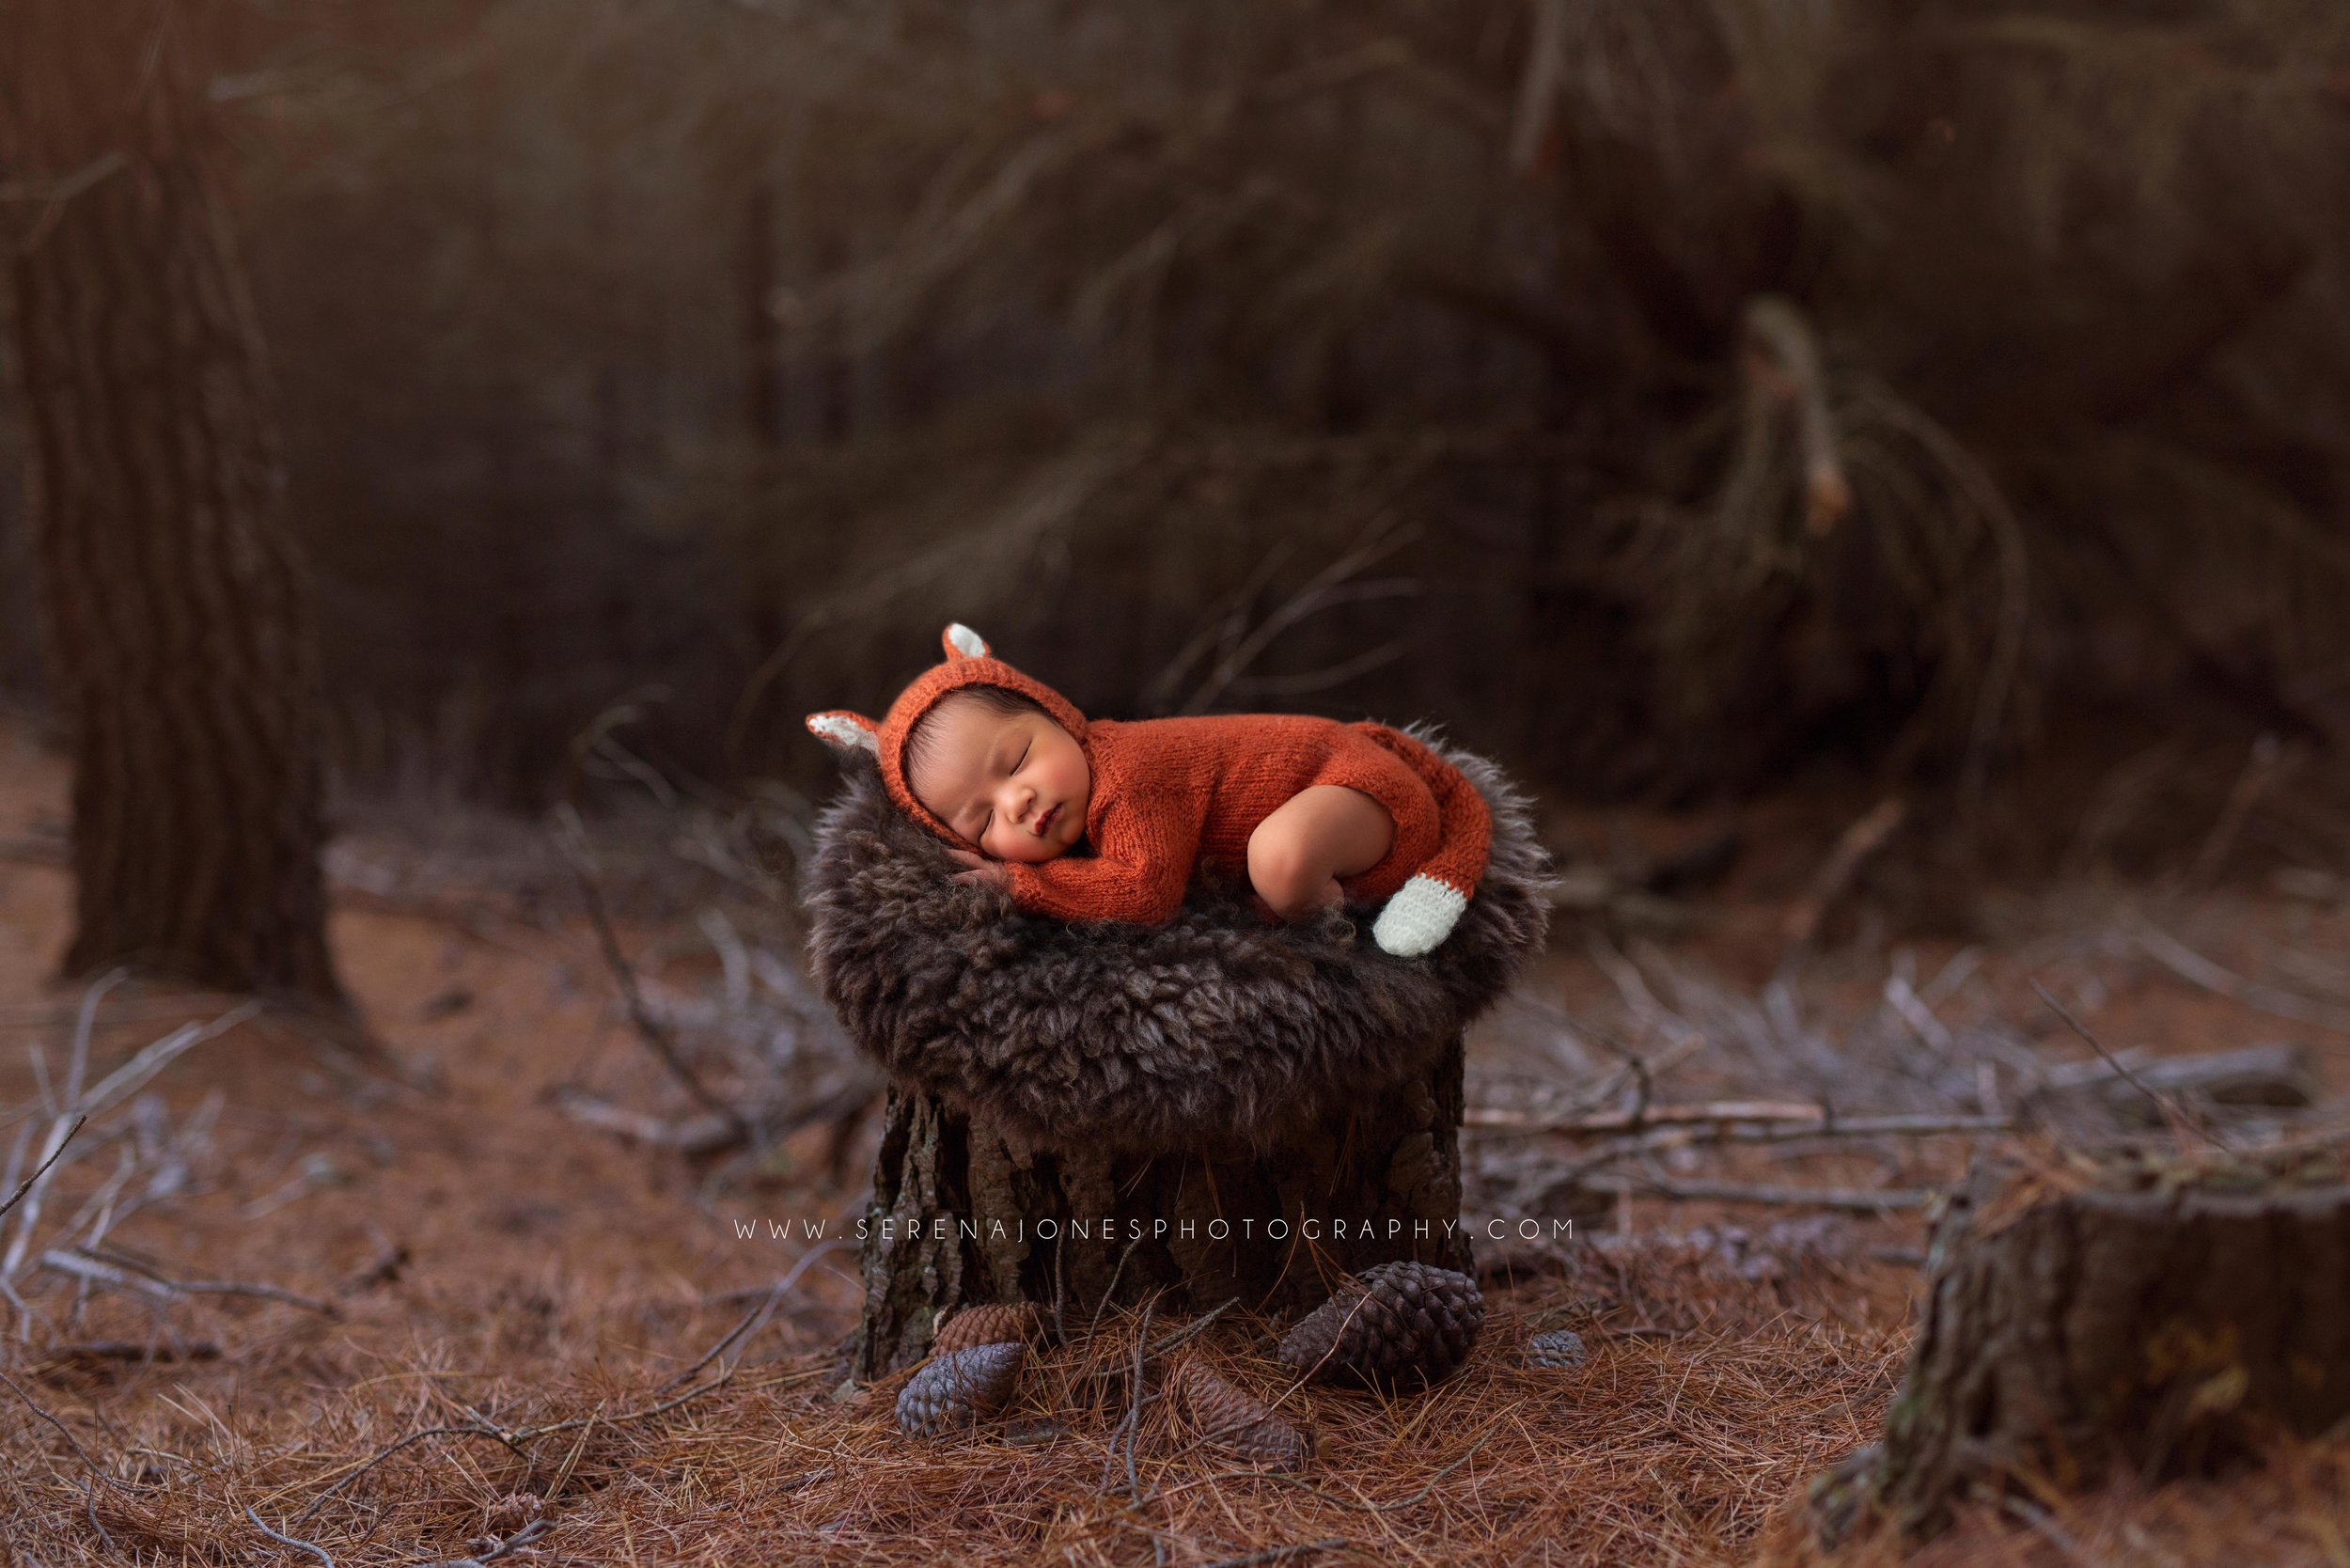 Serena Jones Photography - Tobias Akira Mateo - 33 FB.jpg